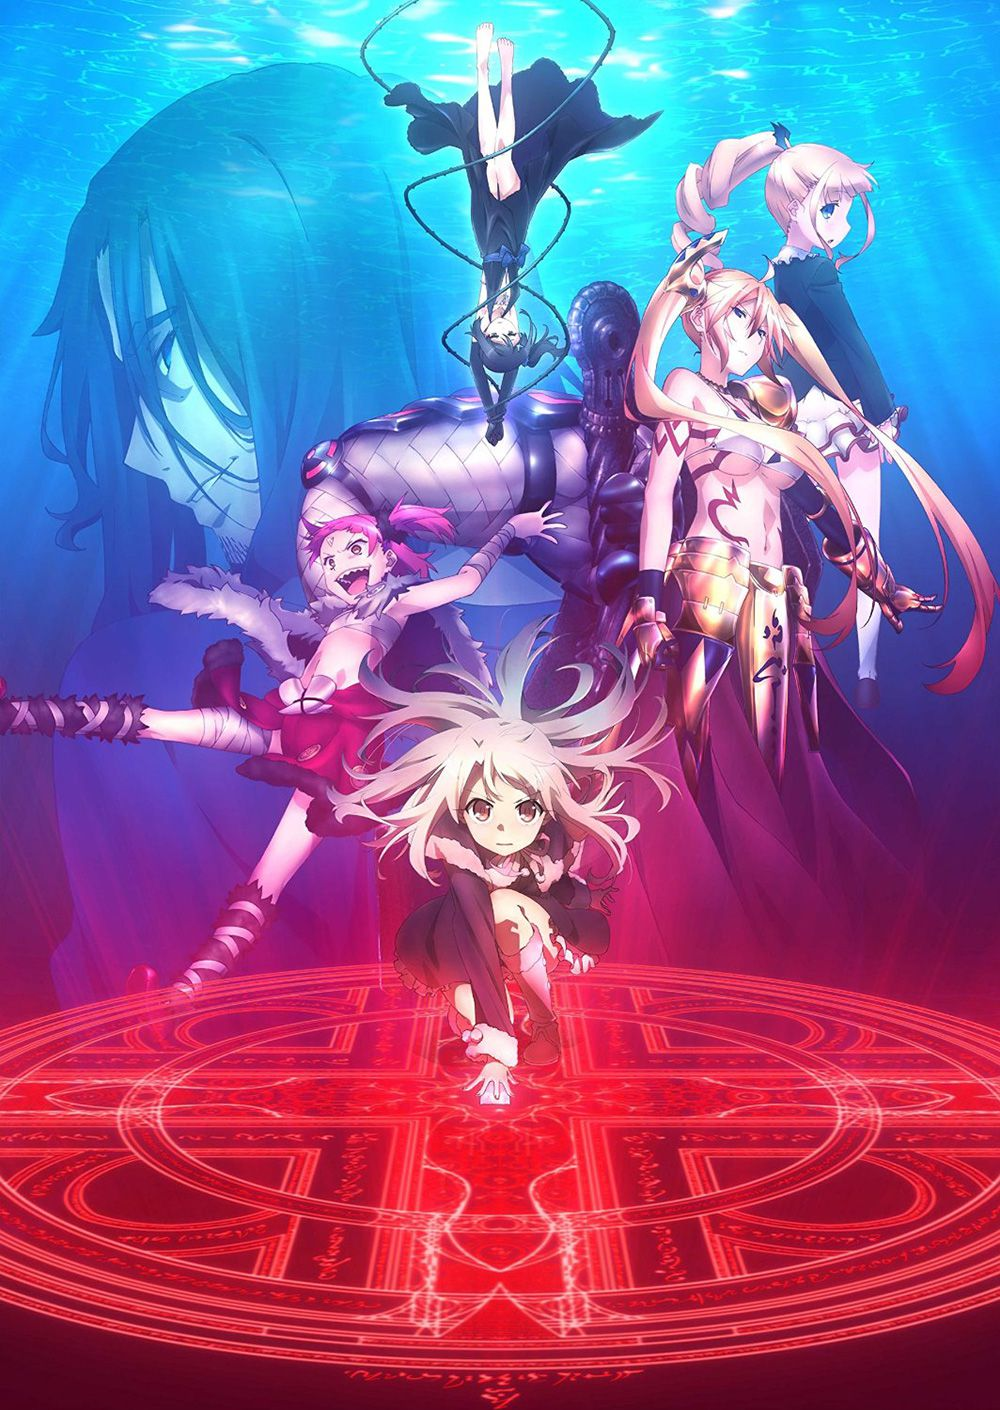 Fate-kaleid-Liner-Prisma-Illya-3rei!!-Anime-Visual-03